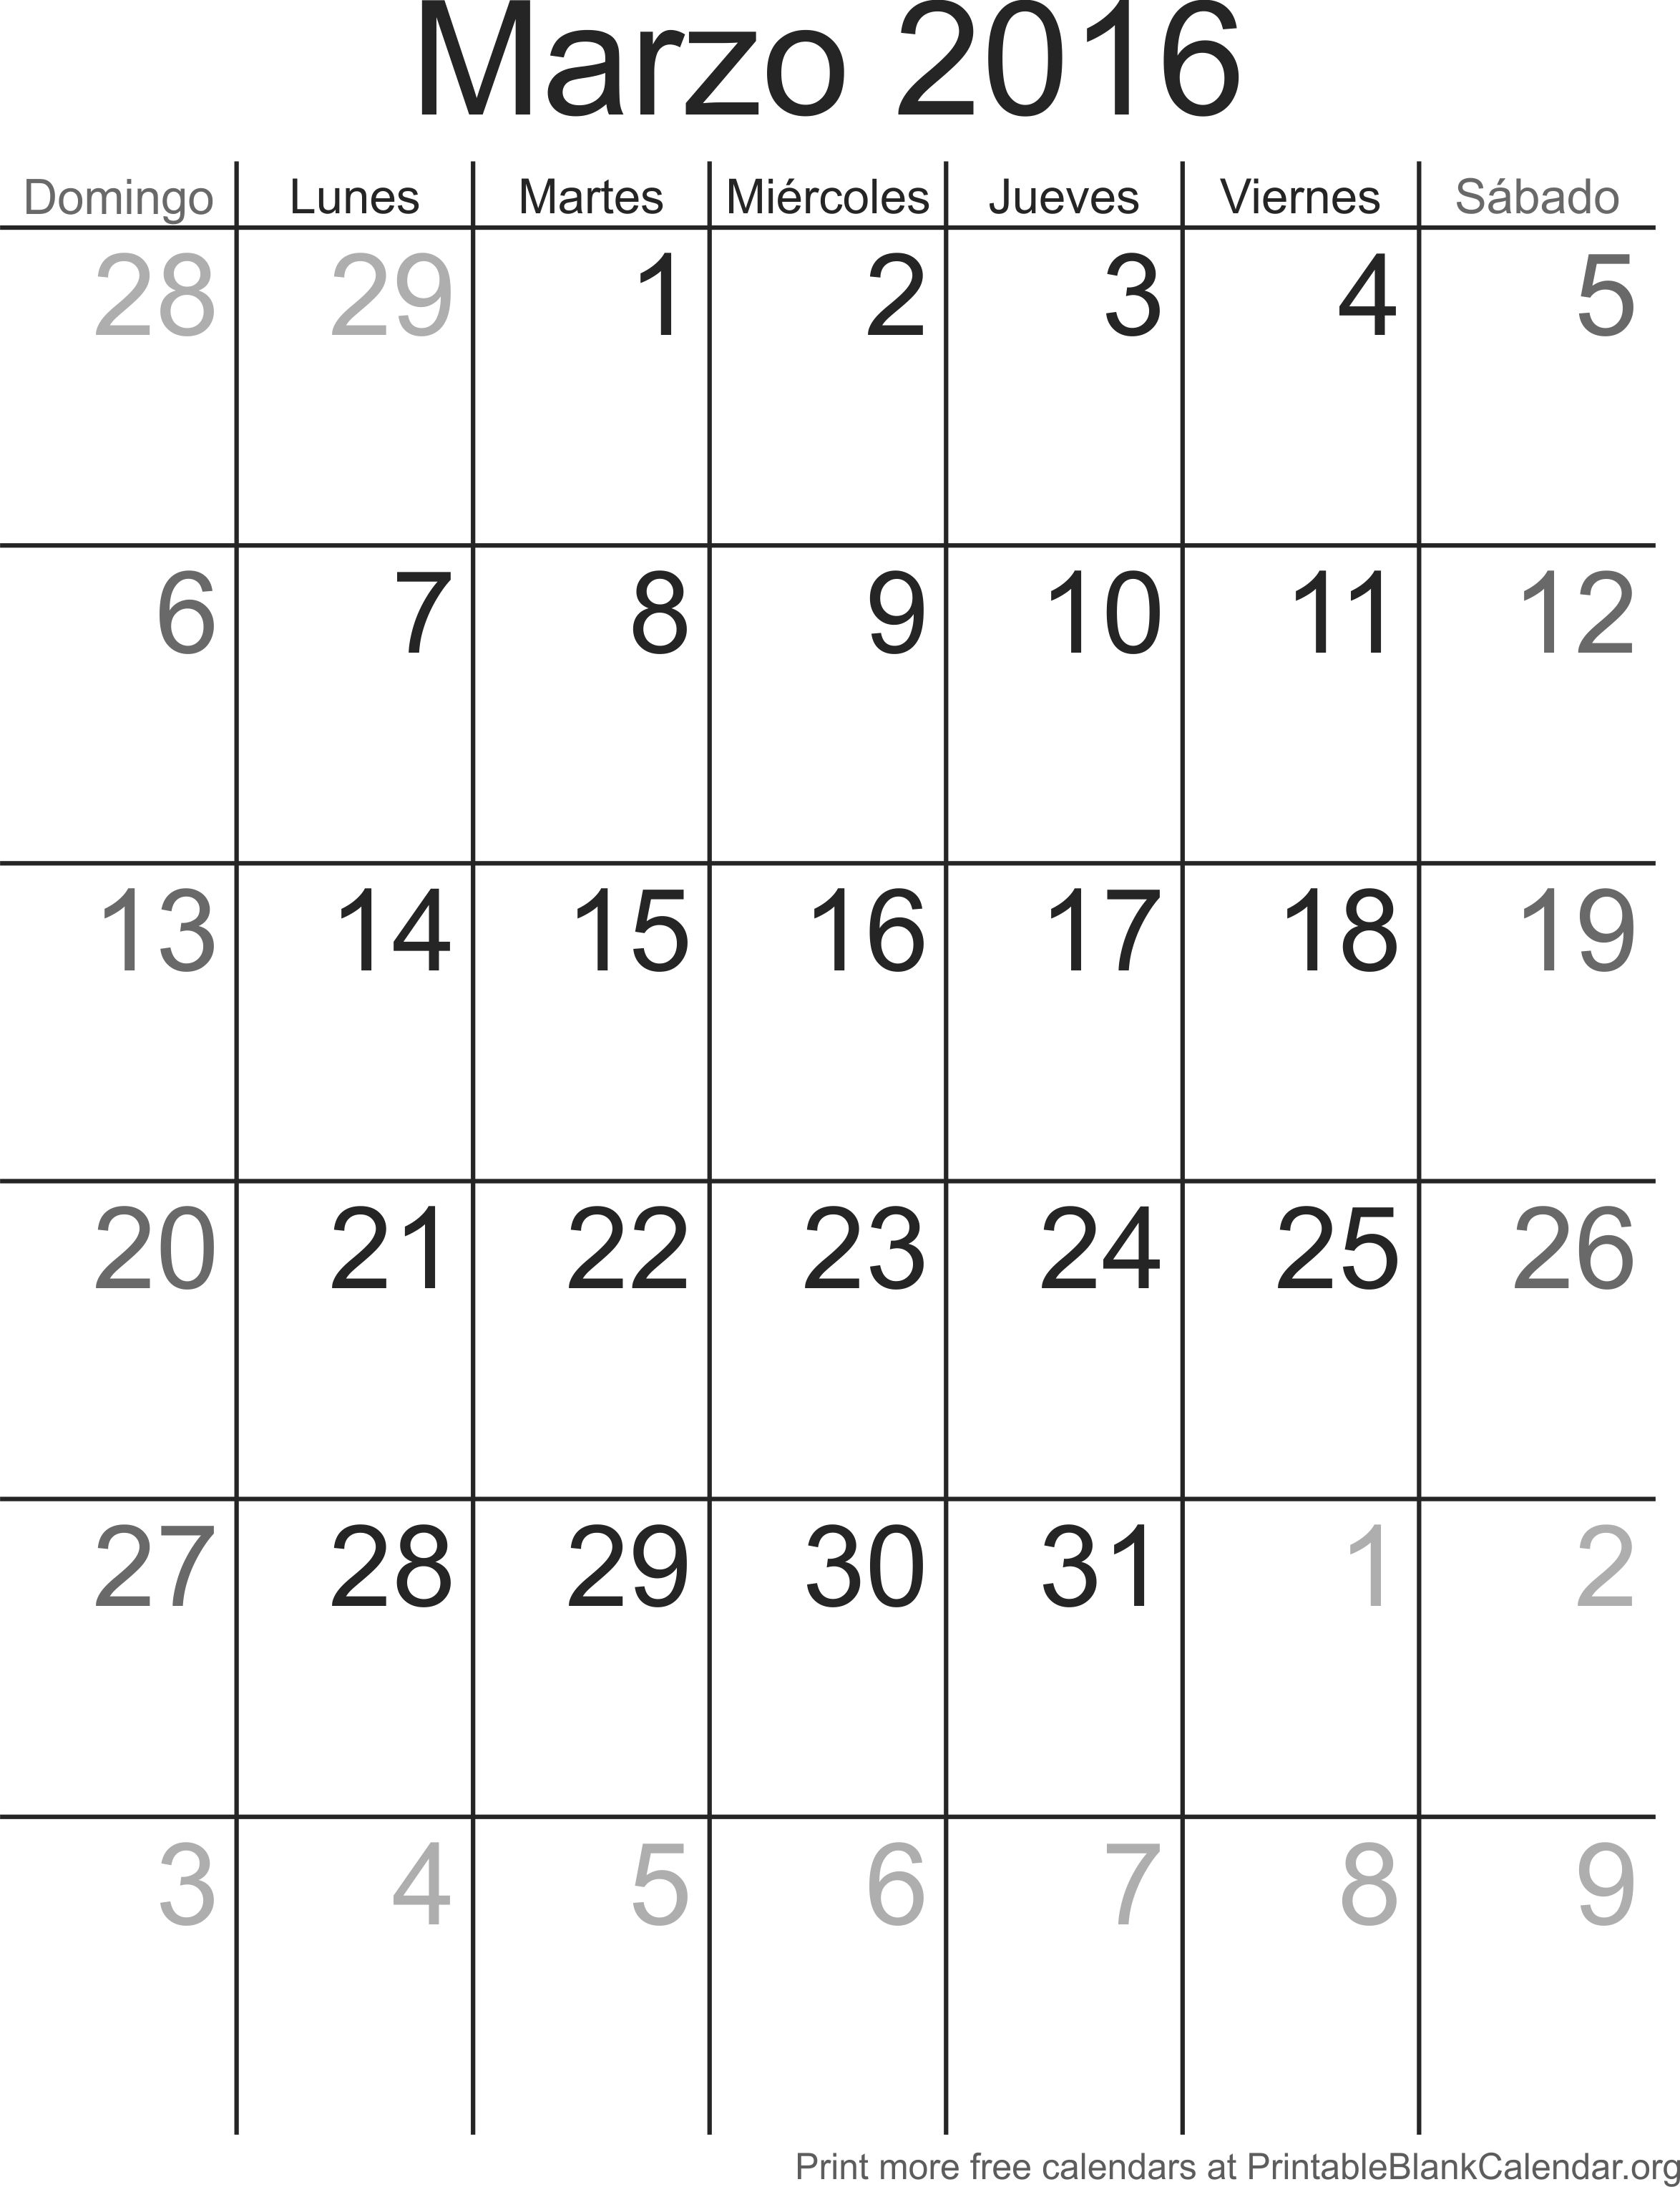 calendario-para-imprimir-febrero-2016